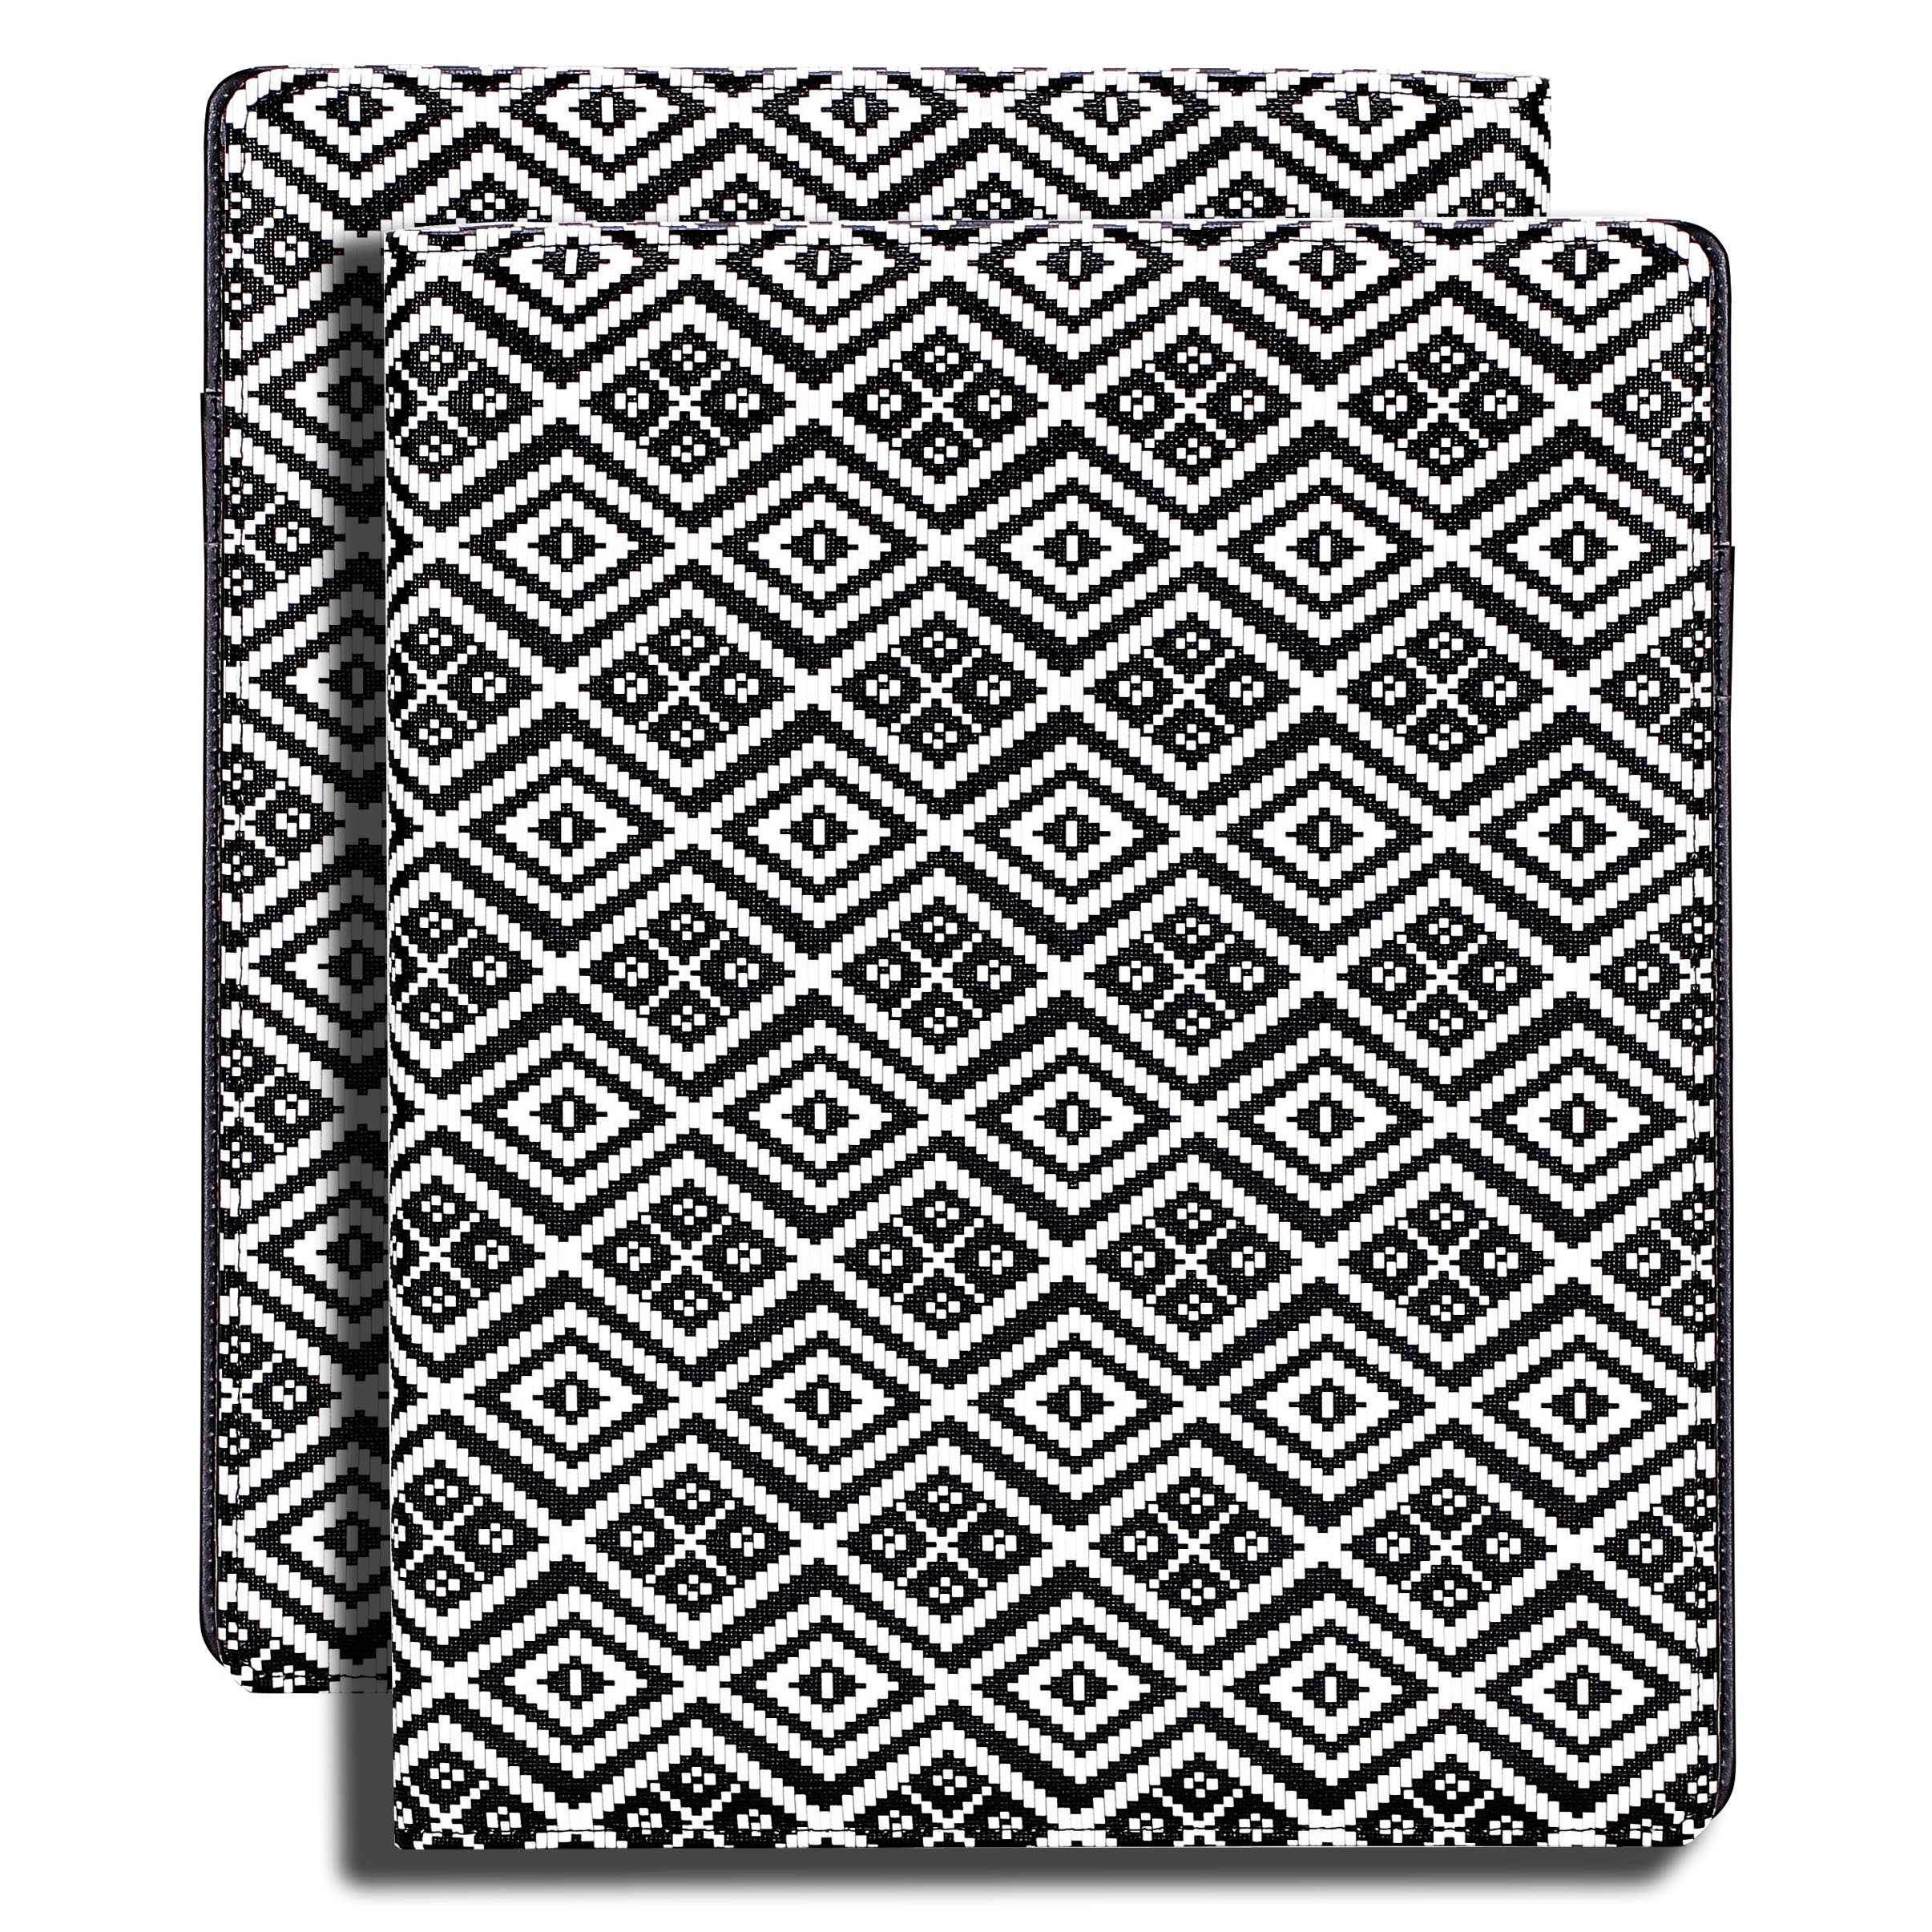 Z PLINRISE Luxury Marble Portfolio File Folder Document Resume Organizer,Padfolio File Holder Folders Letter Size,Standard 3 Ring Binder with Clipboard (Black and White Diamond) by Z PLINRISE (Image #7)